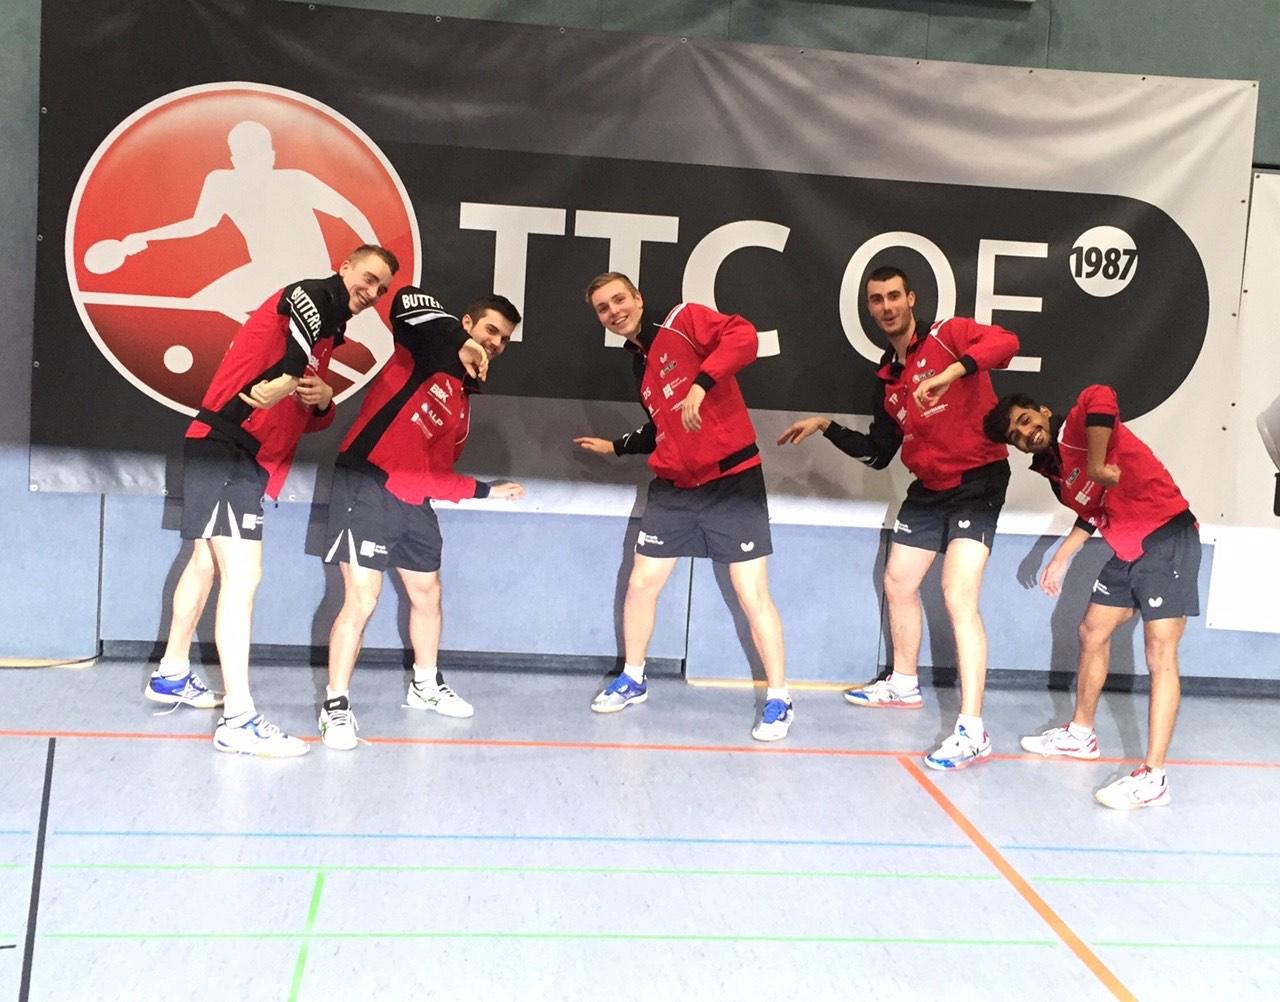 images/Fun Team TTC OE.jpg